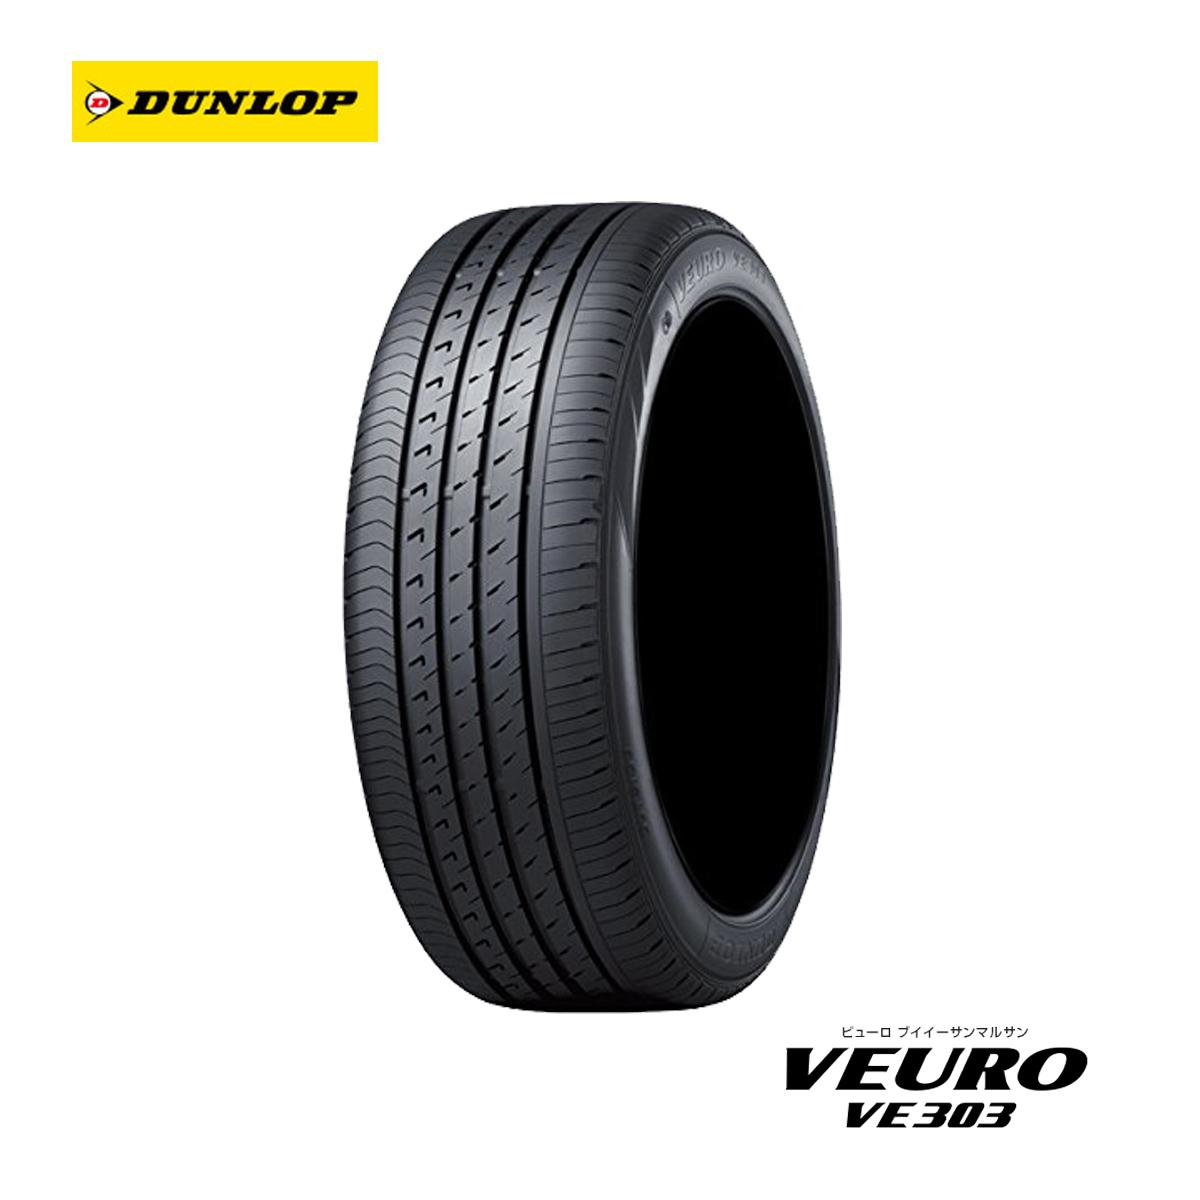 DUNLOP ダンロップ 吸音スポンジ搭載 プレミアム コンフォート 低燃費 サマータイヤ 2本 16インチ 205/60R16 VEURO VE303 ビューロ